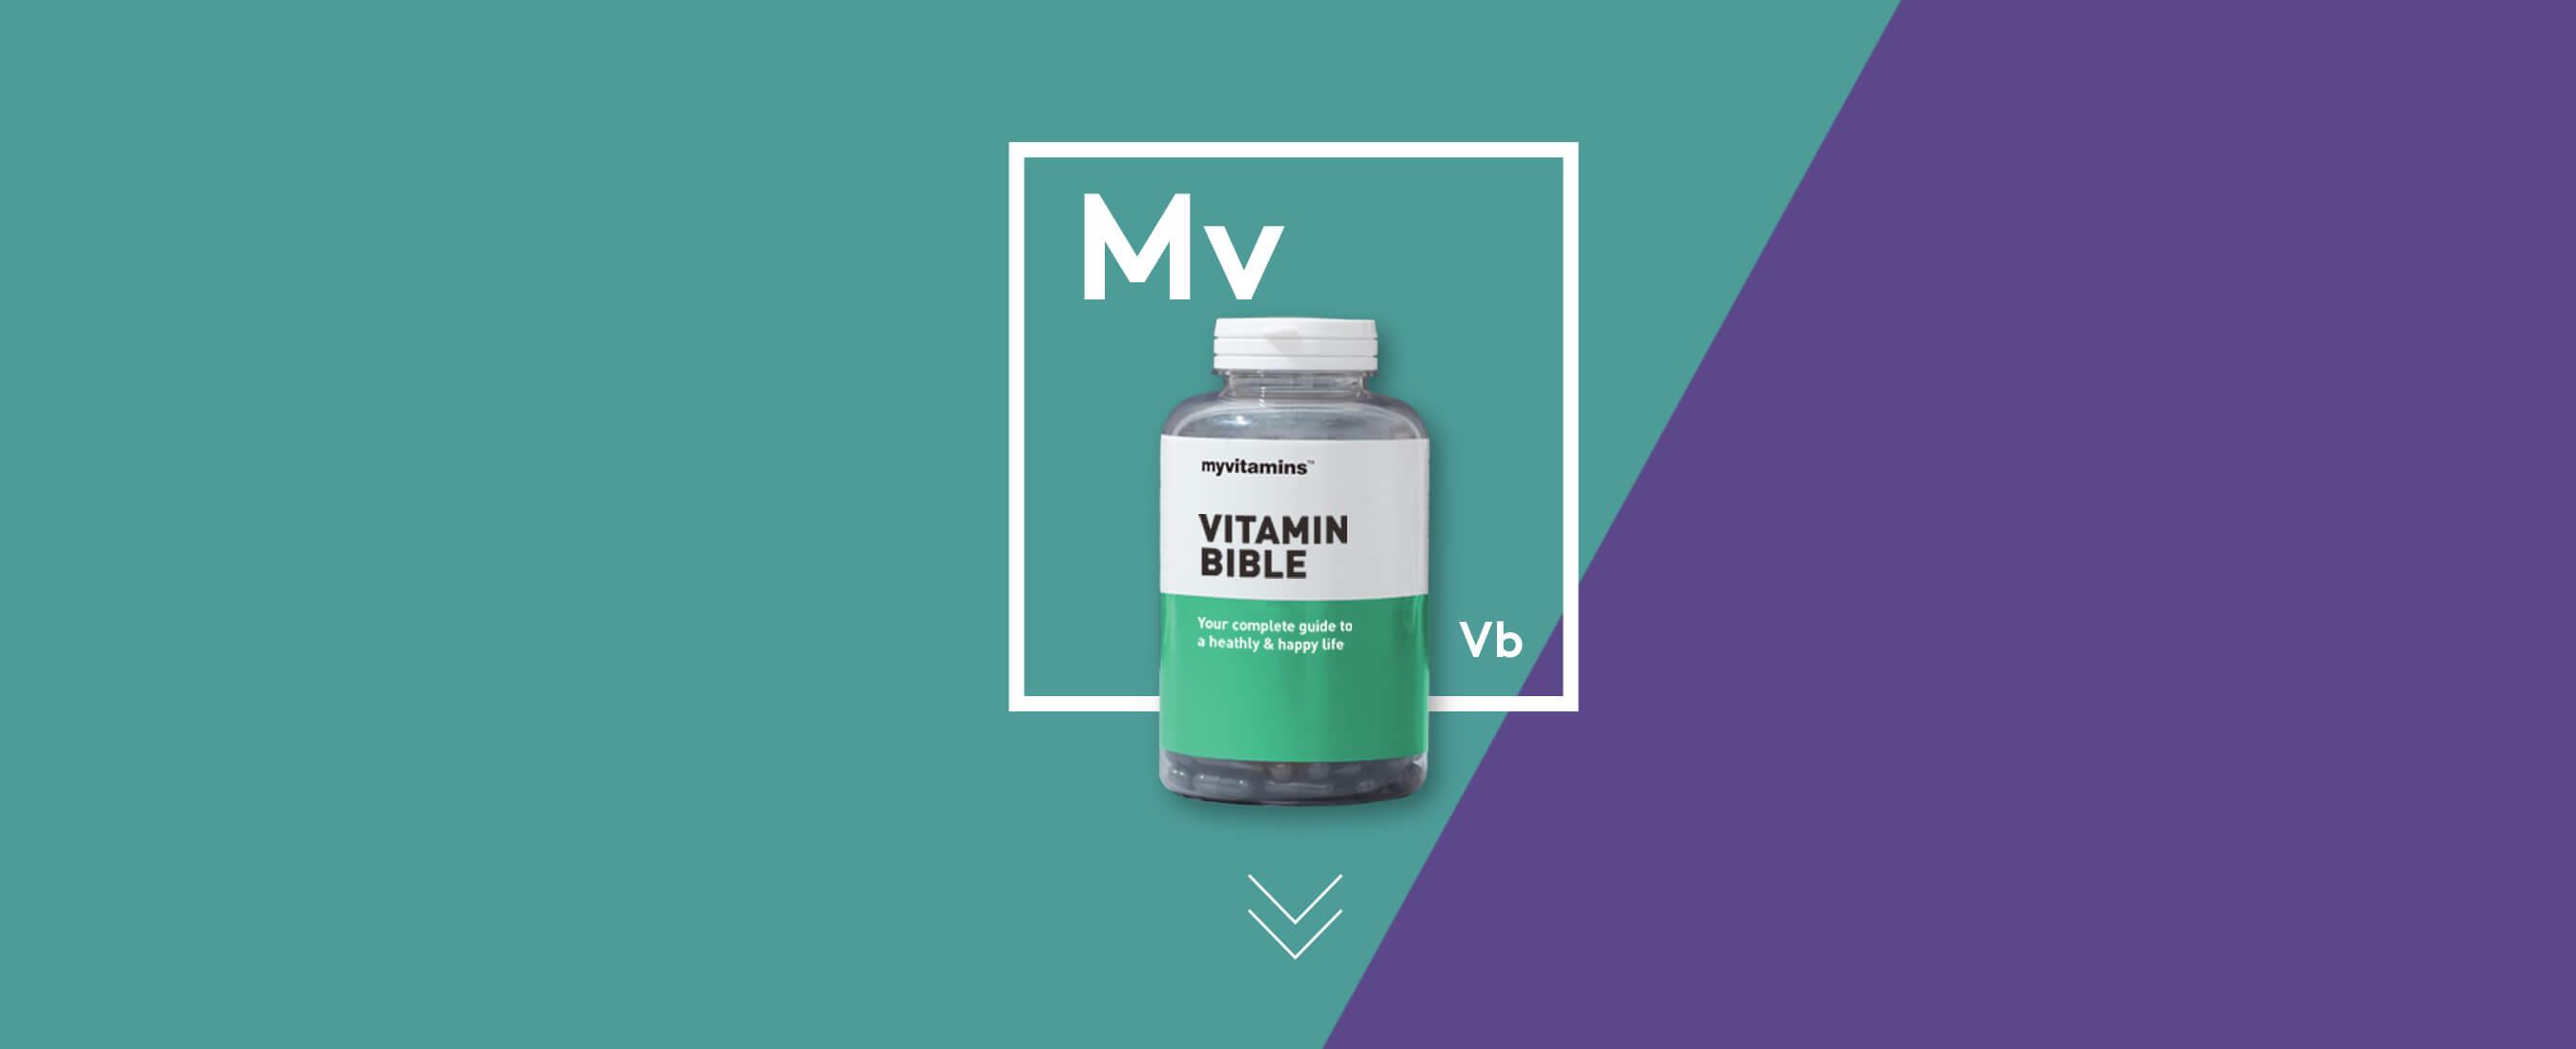 Myvitamins | A-Z Bible